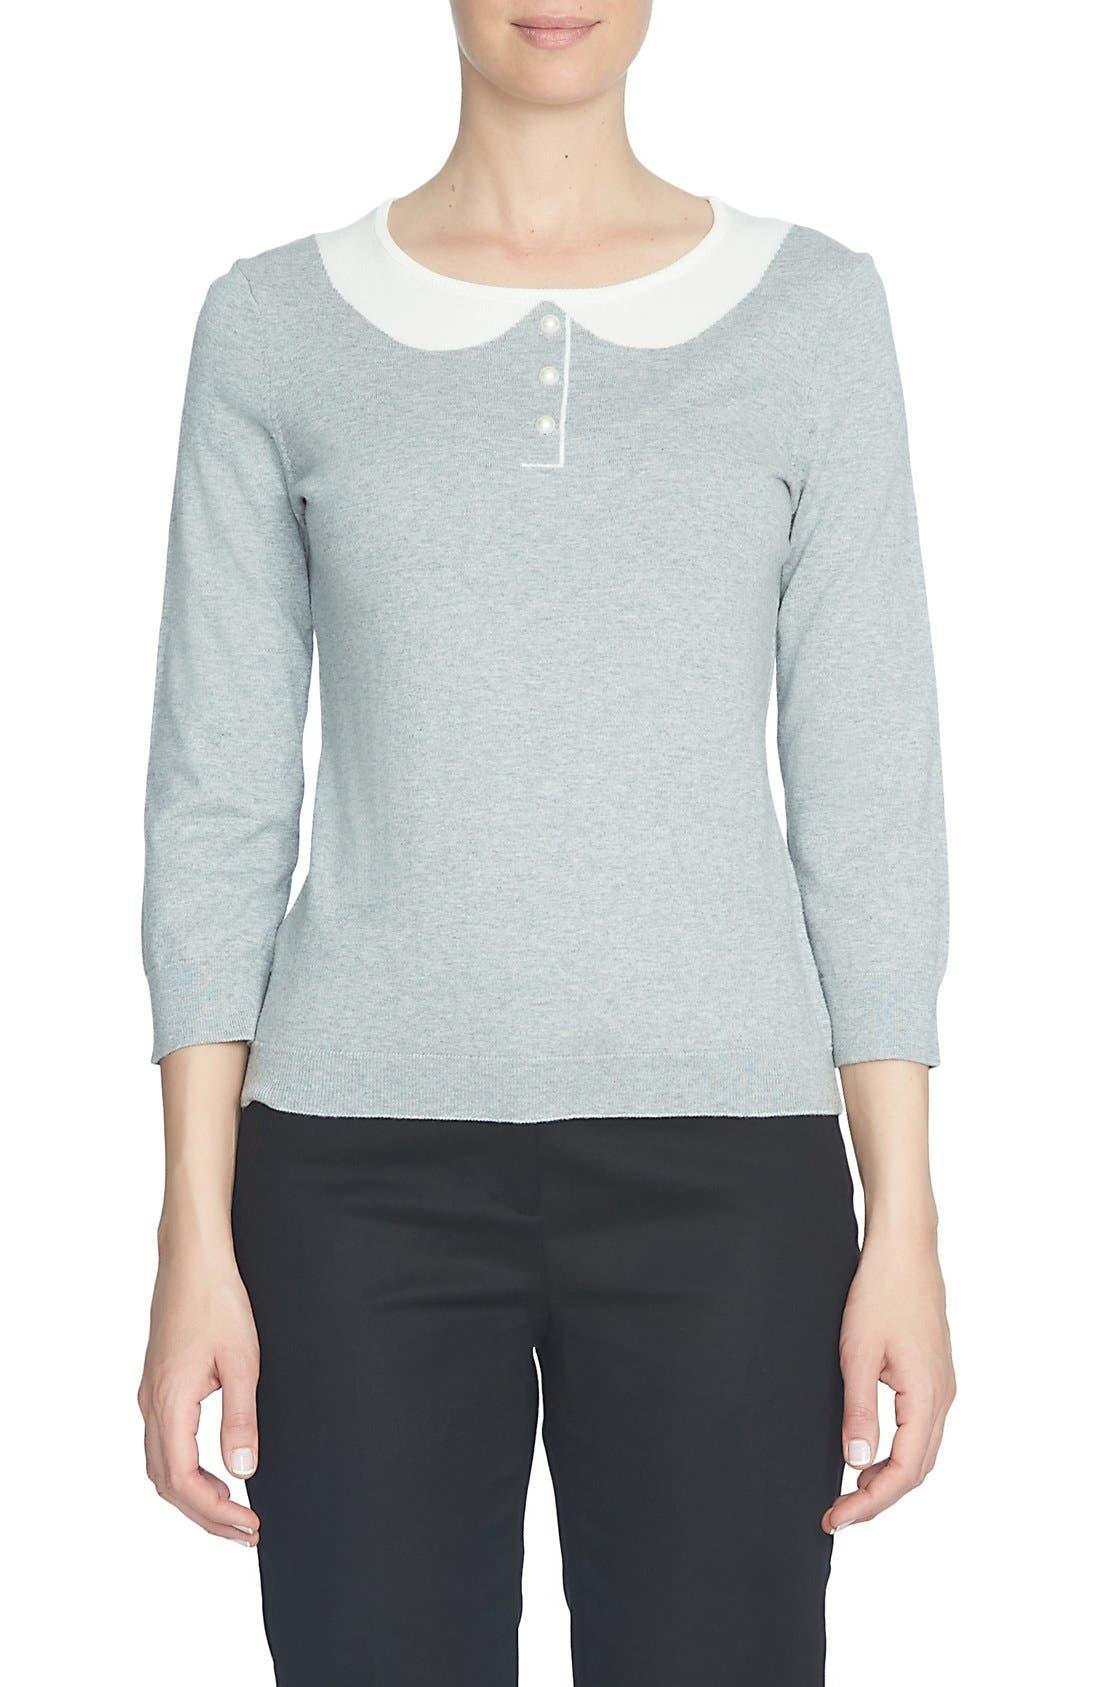 Alternate Image 1 Selected - CeCe Intarsia Collar Sweater